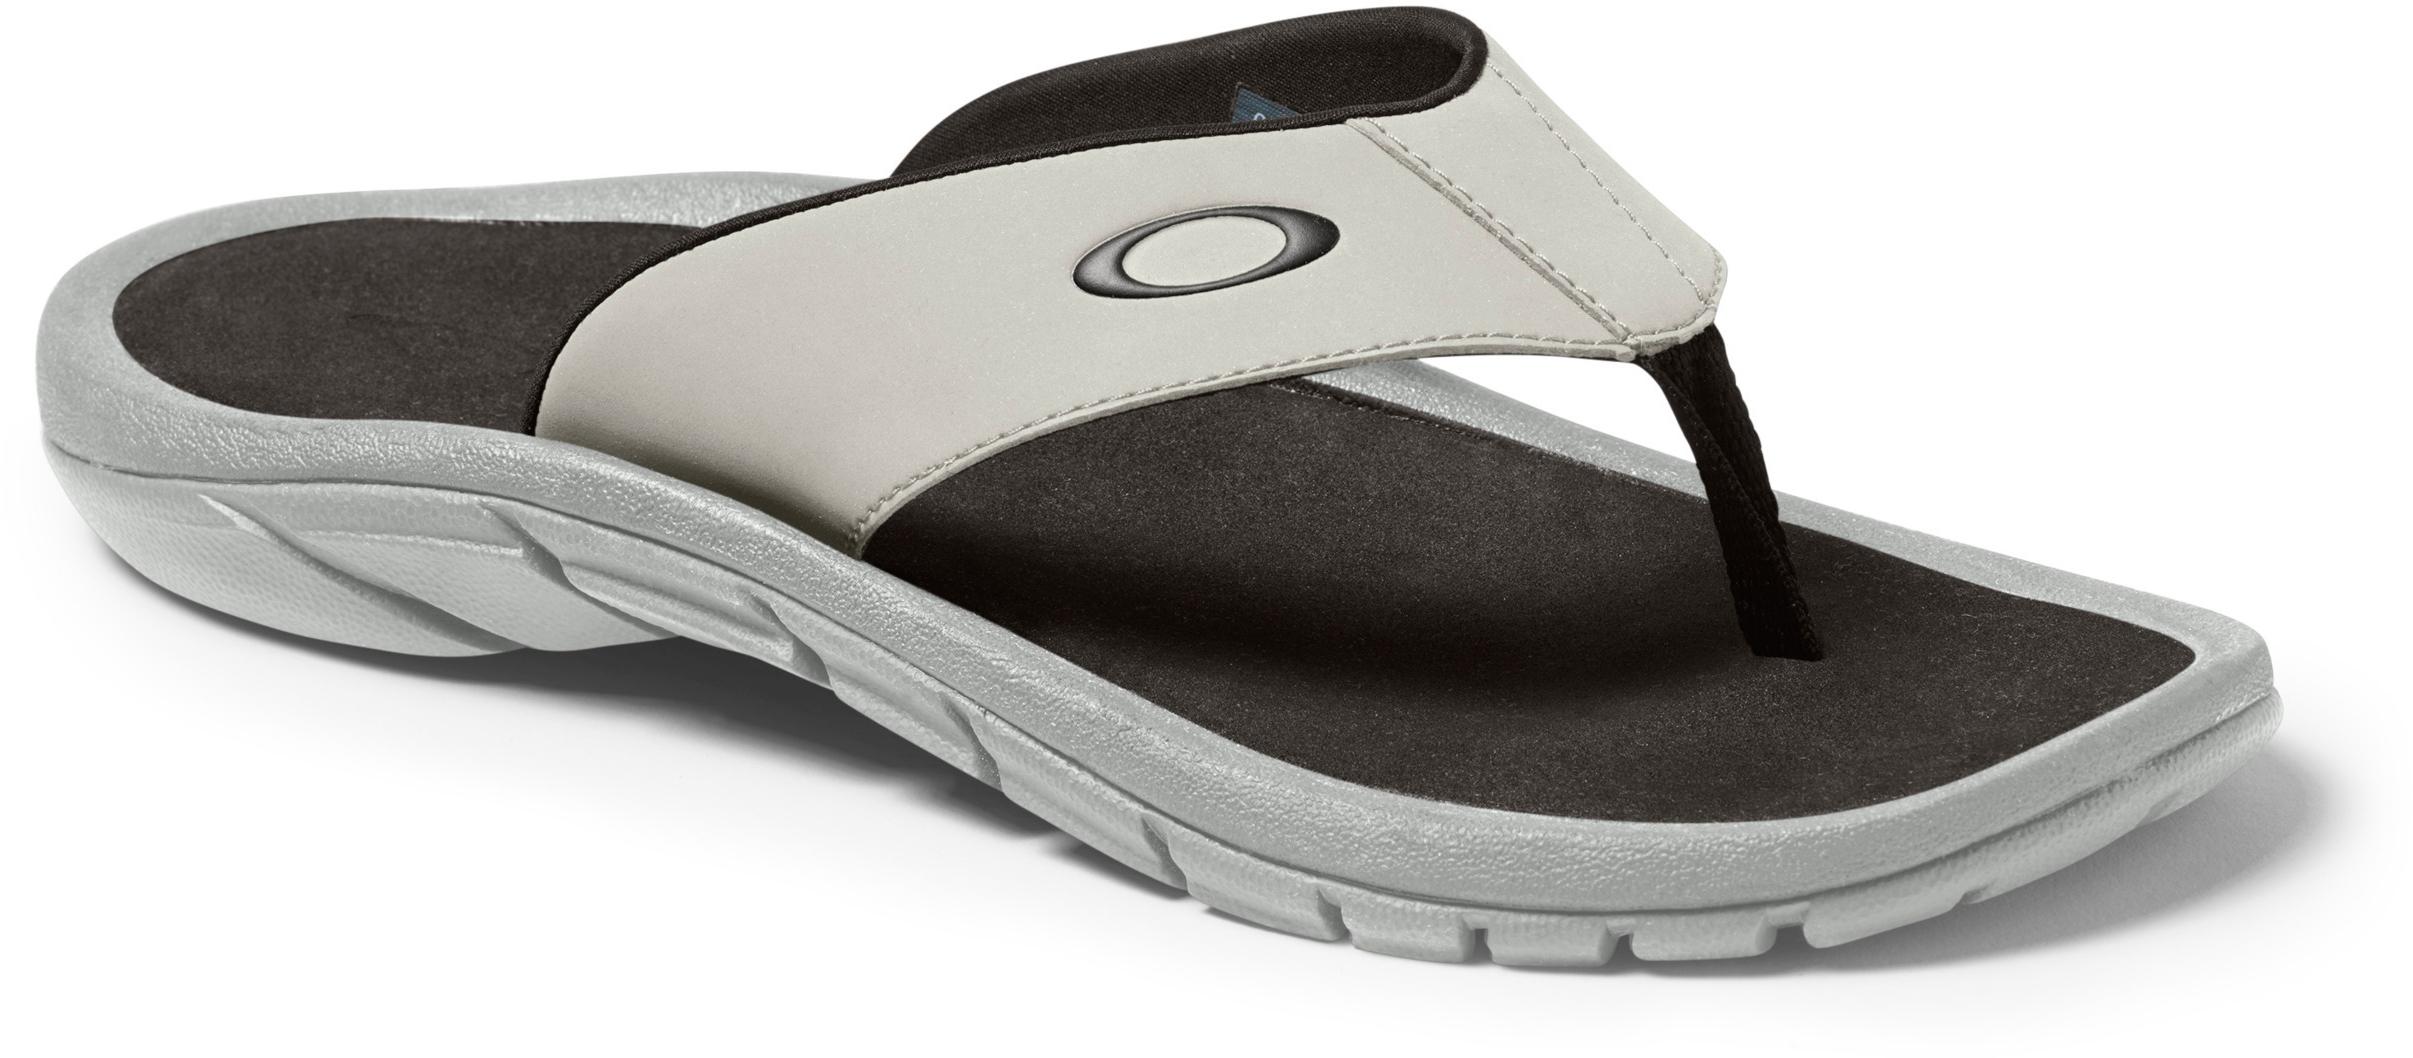 66e3dbe634b SUPER COIL 2.0 Sandal 2019 stone grey